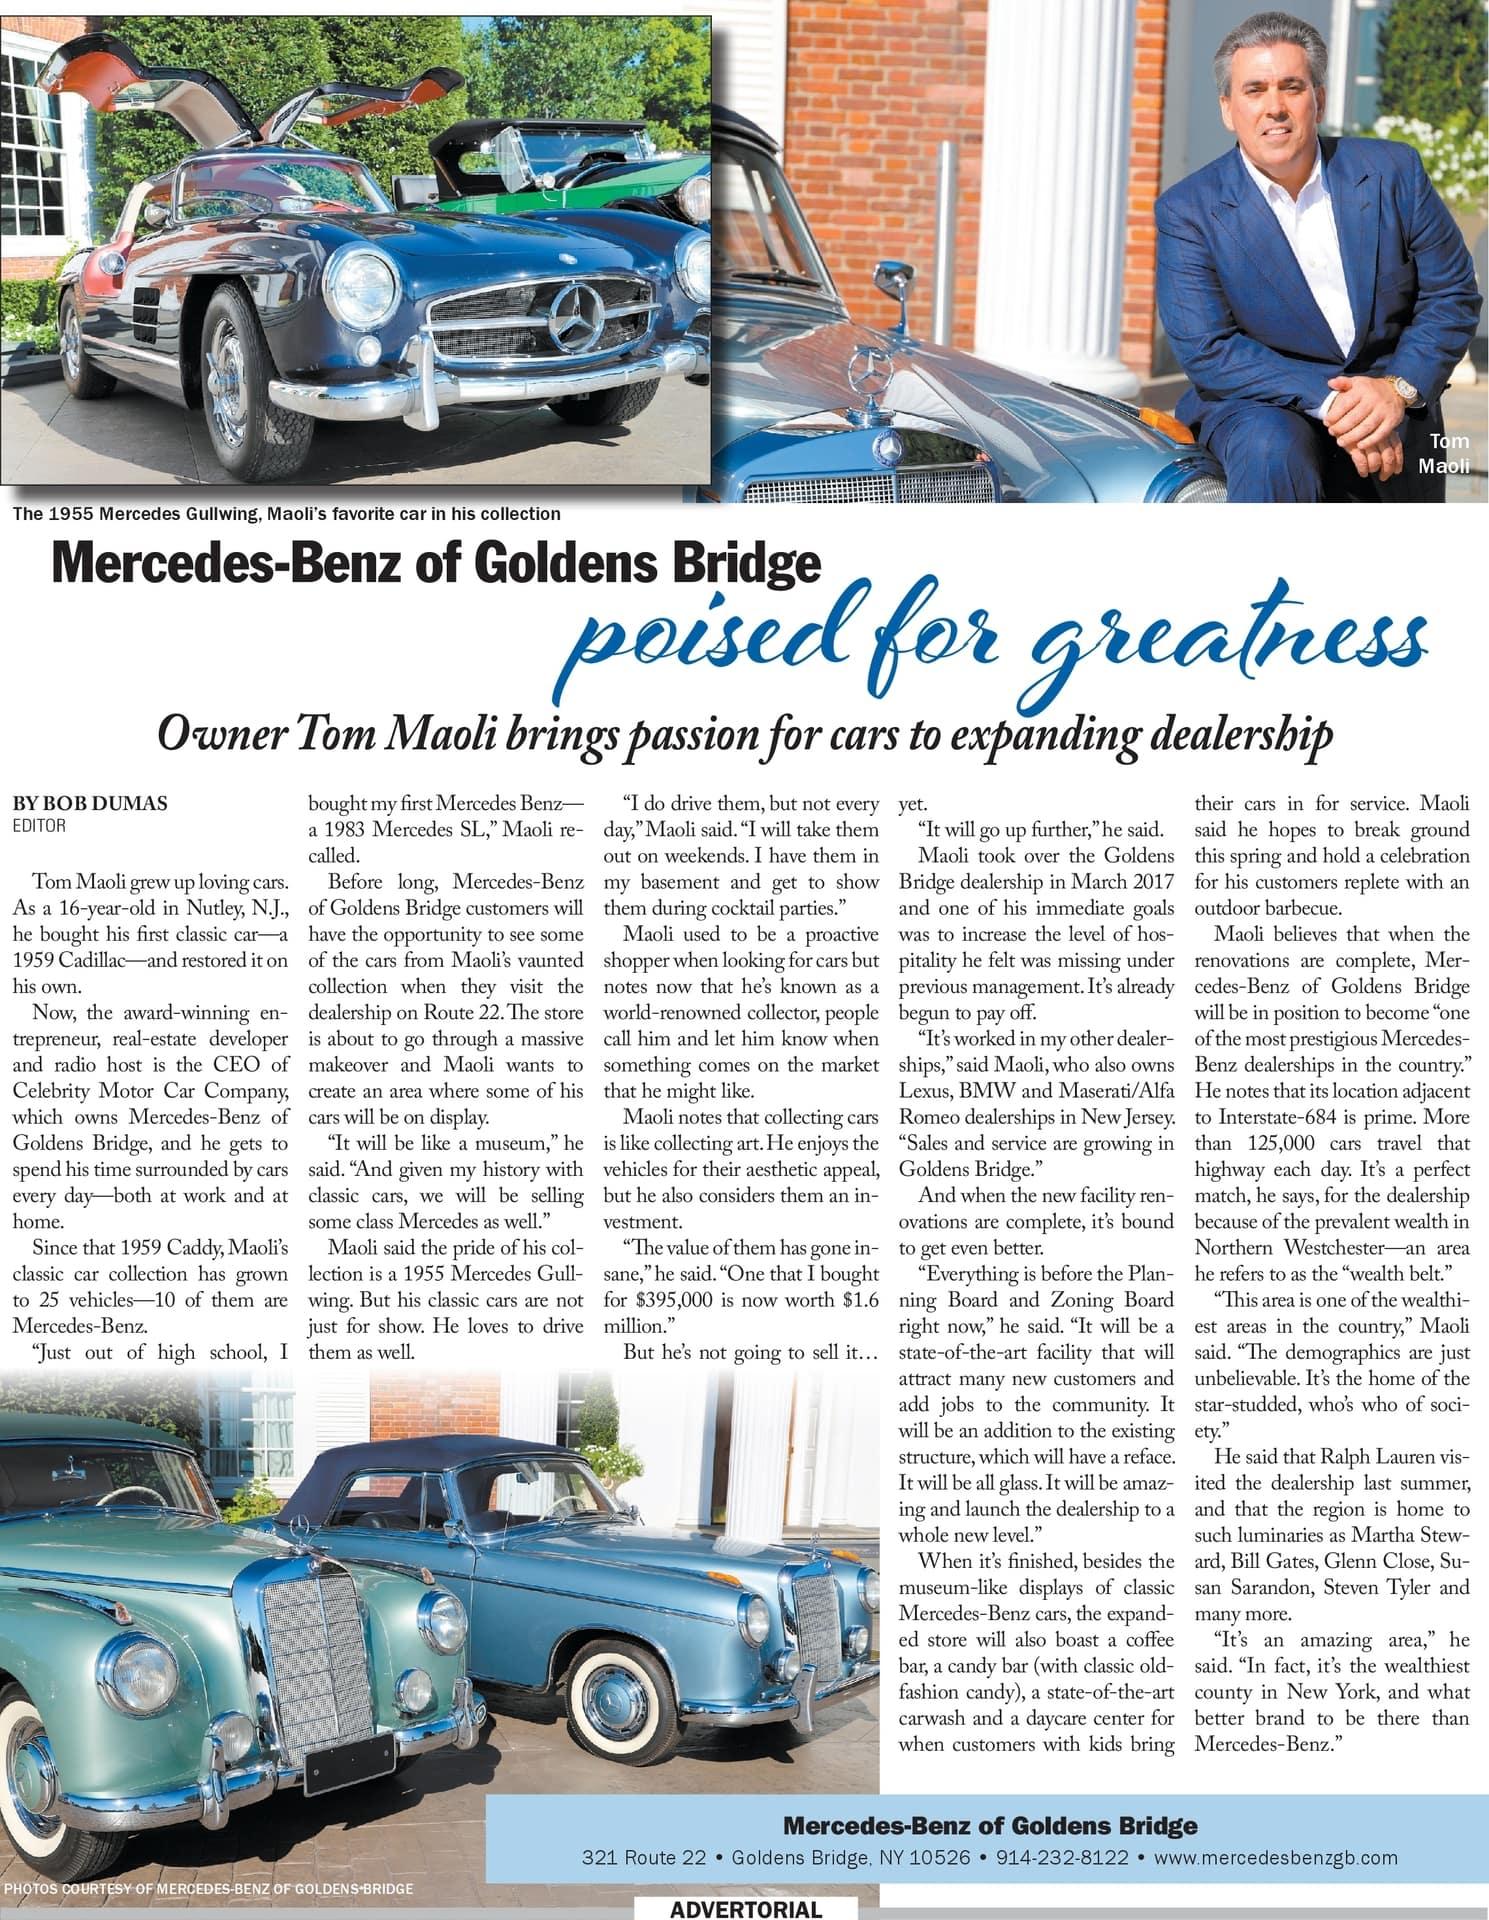 Mercedes-Benz of Goldens Bridge Advertorial